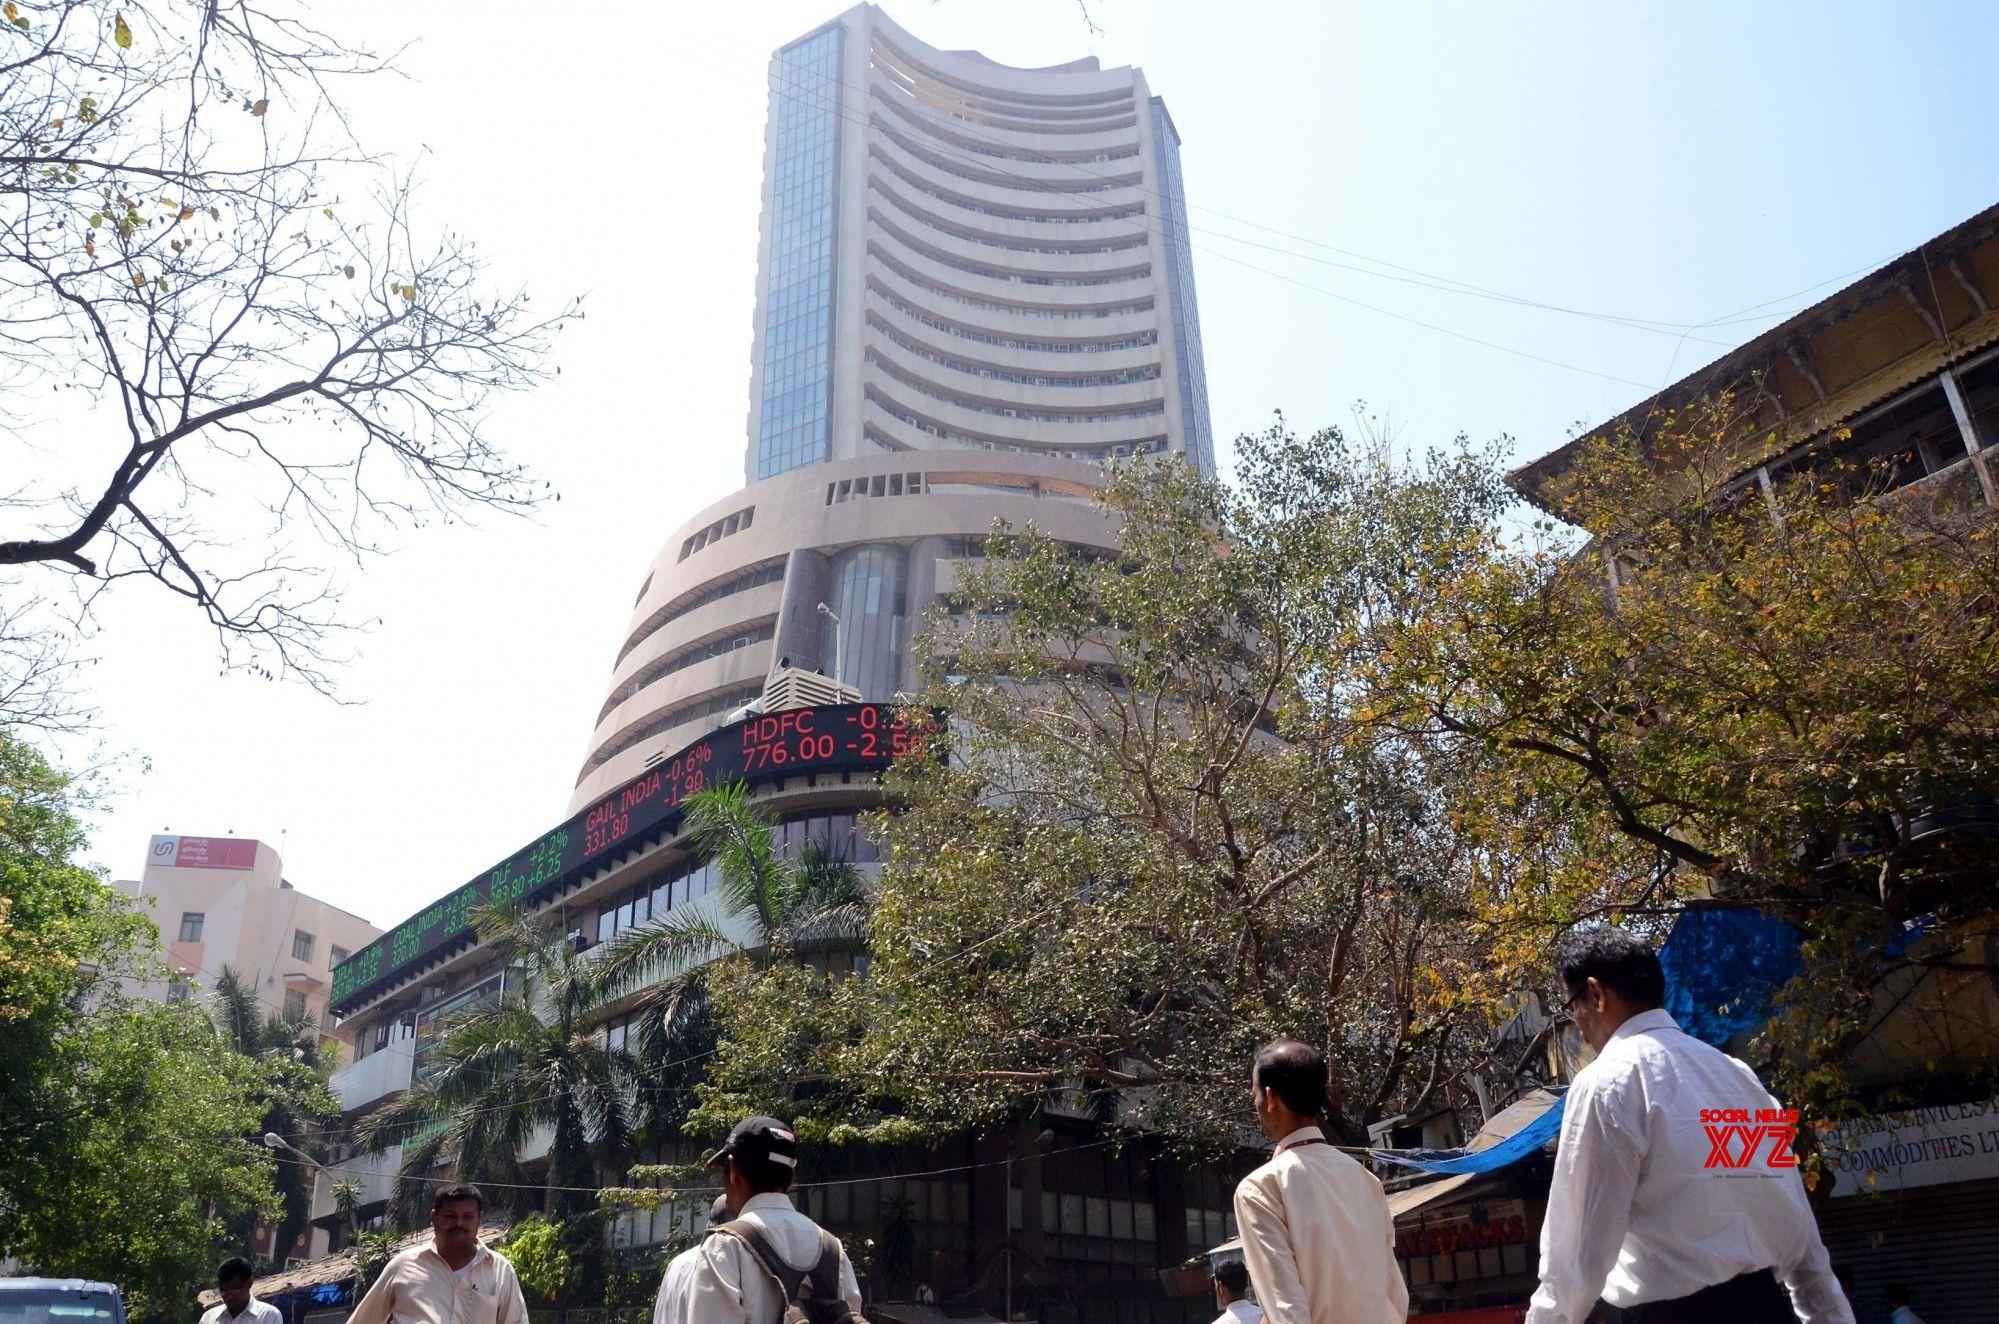 Sensex soars 1,400 points; banking, finance stocks surge